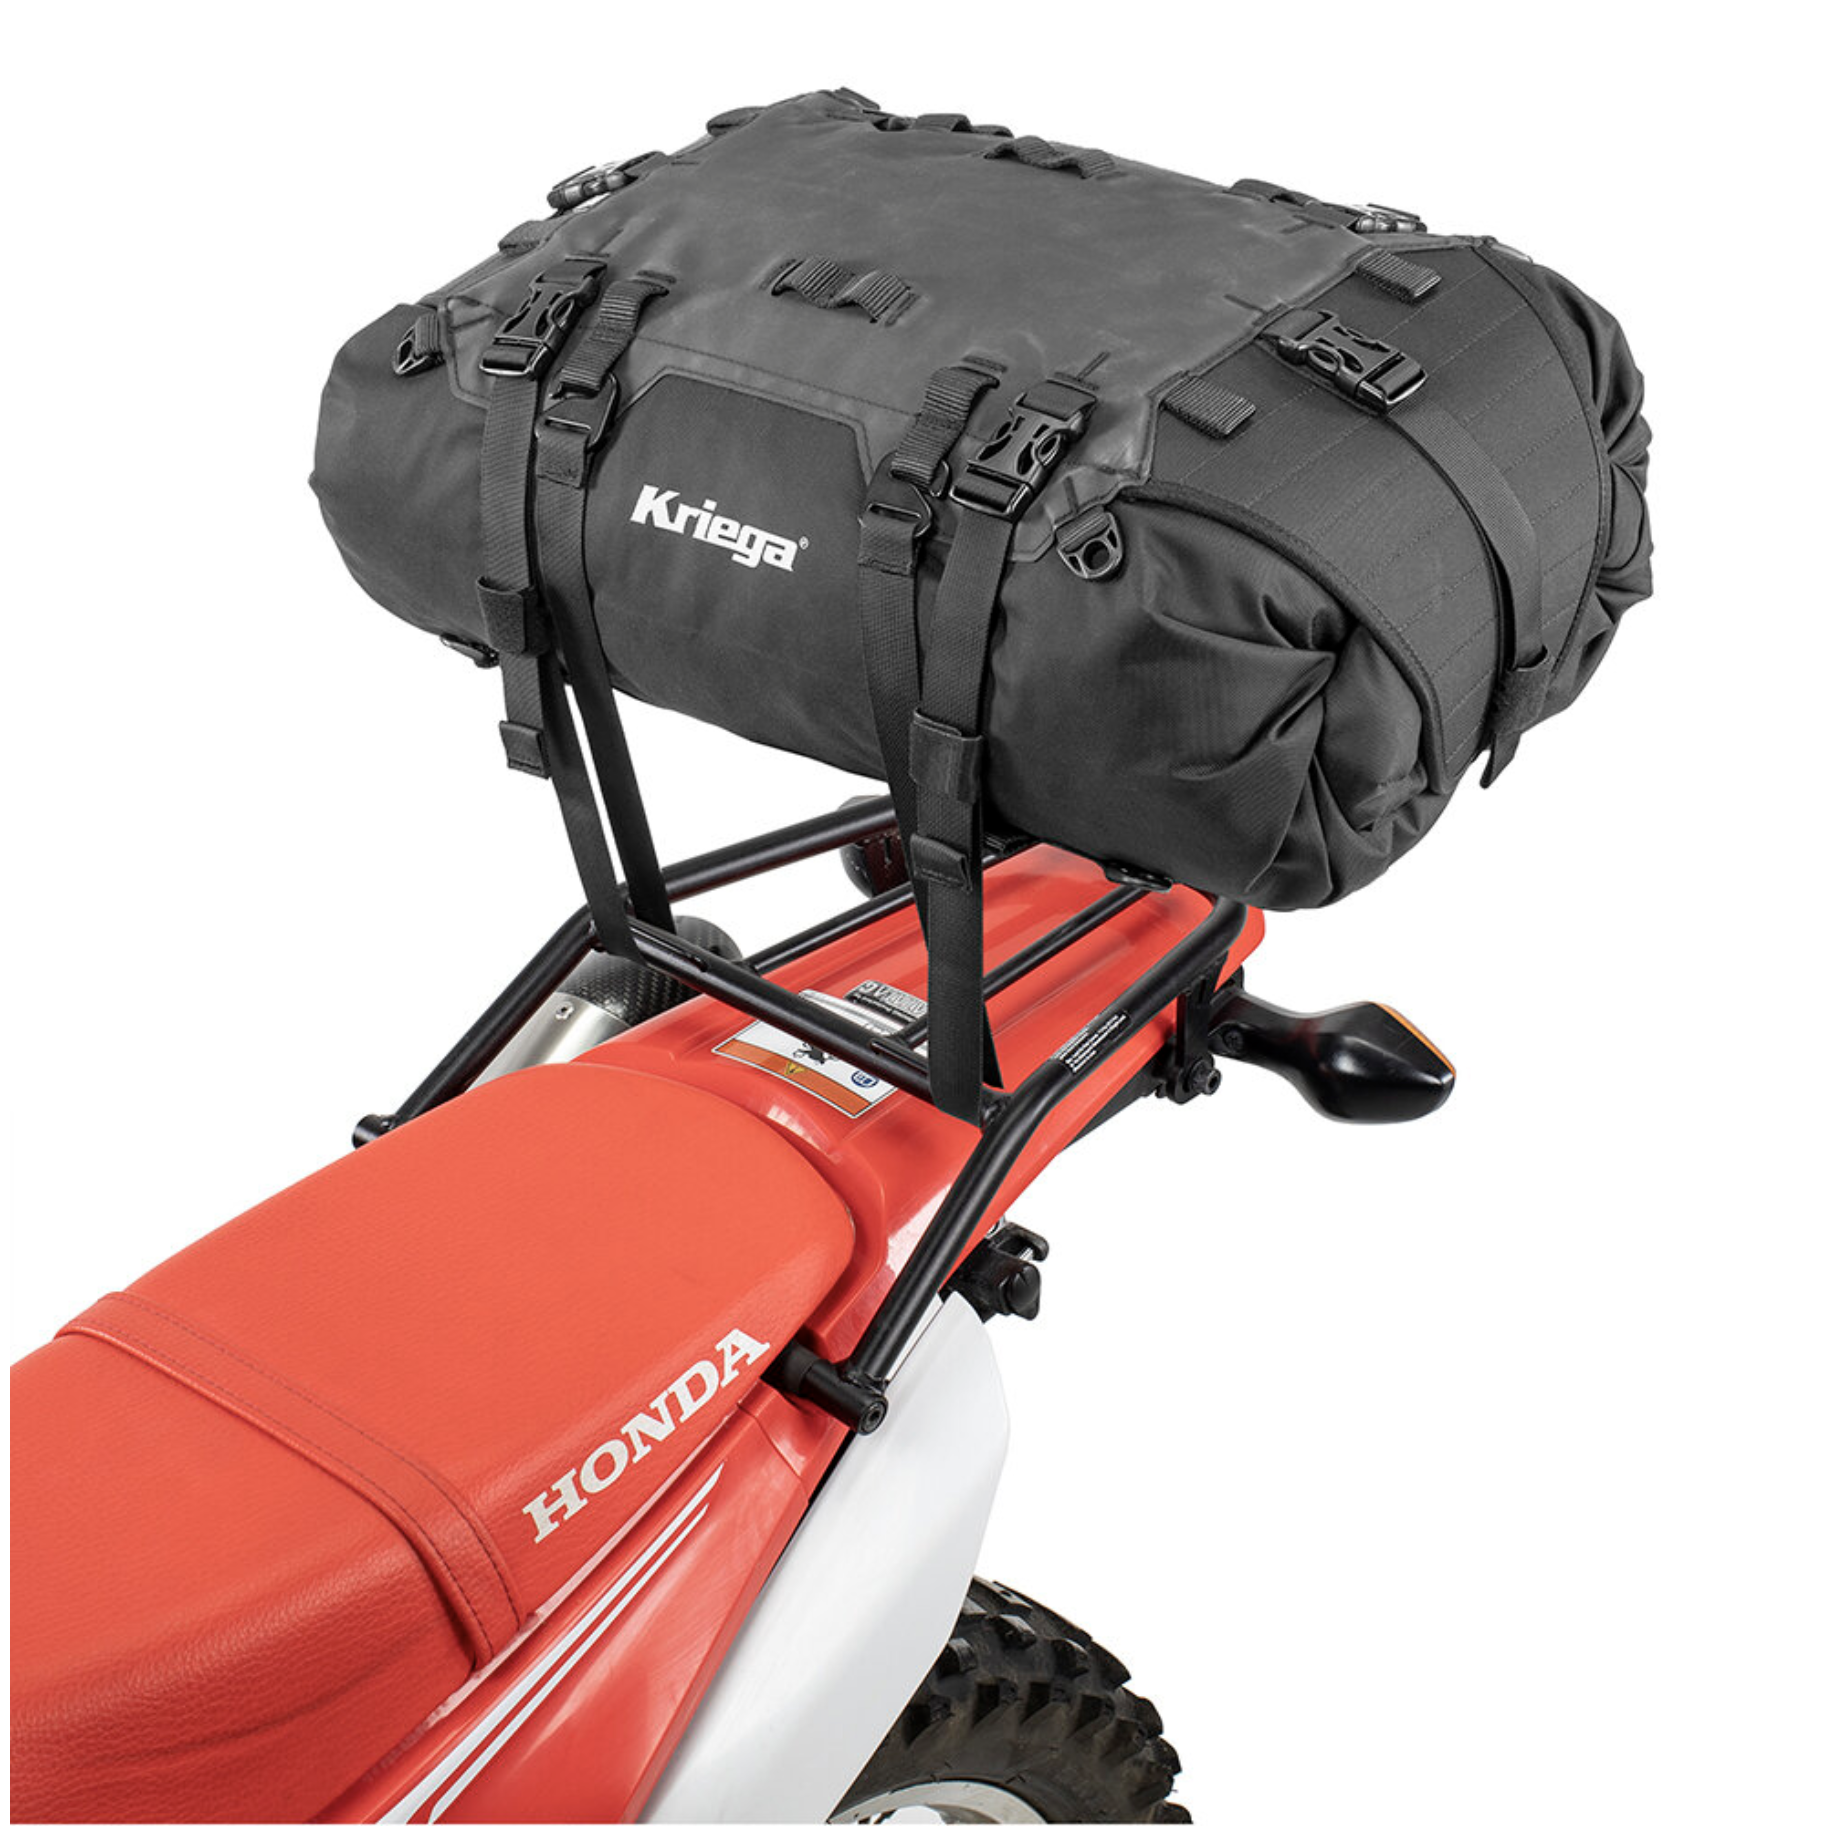 Kriega-US-40-Drypack-Tasche-Halter-01